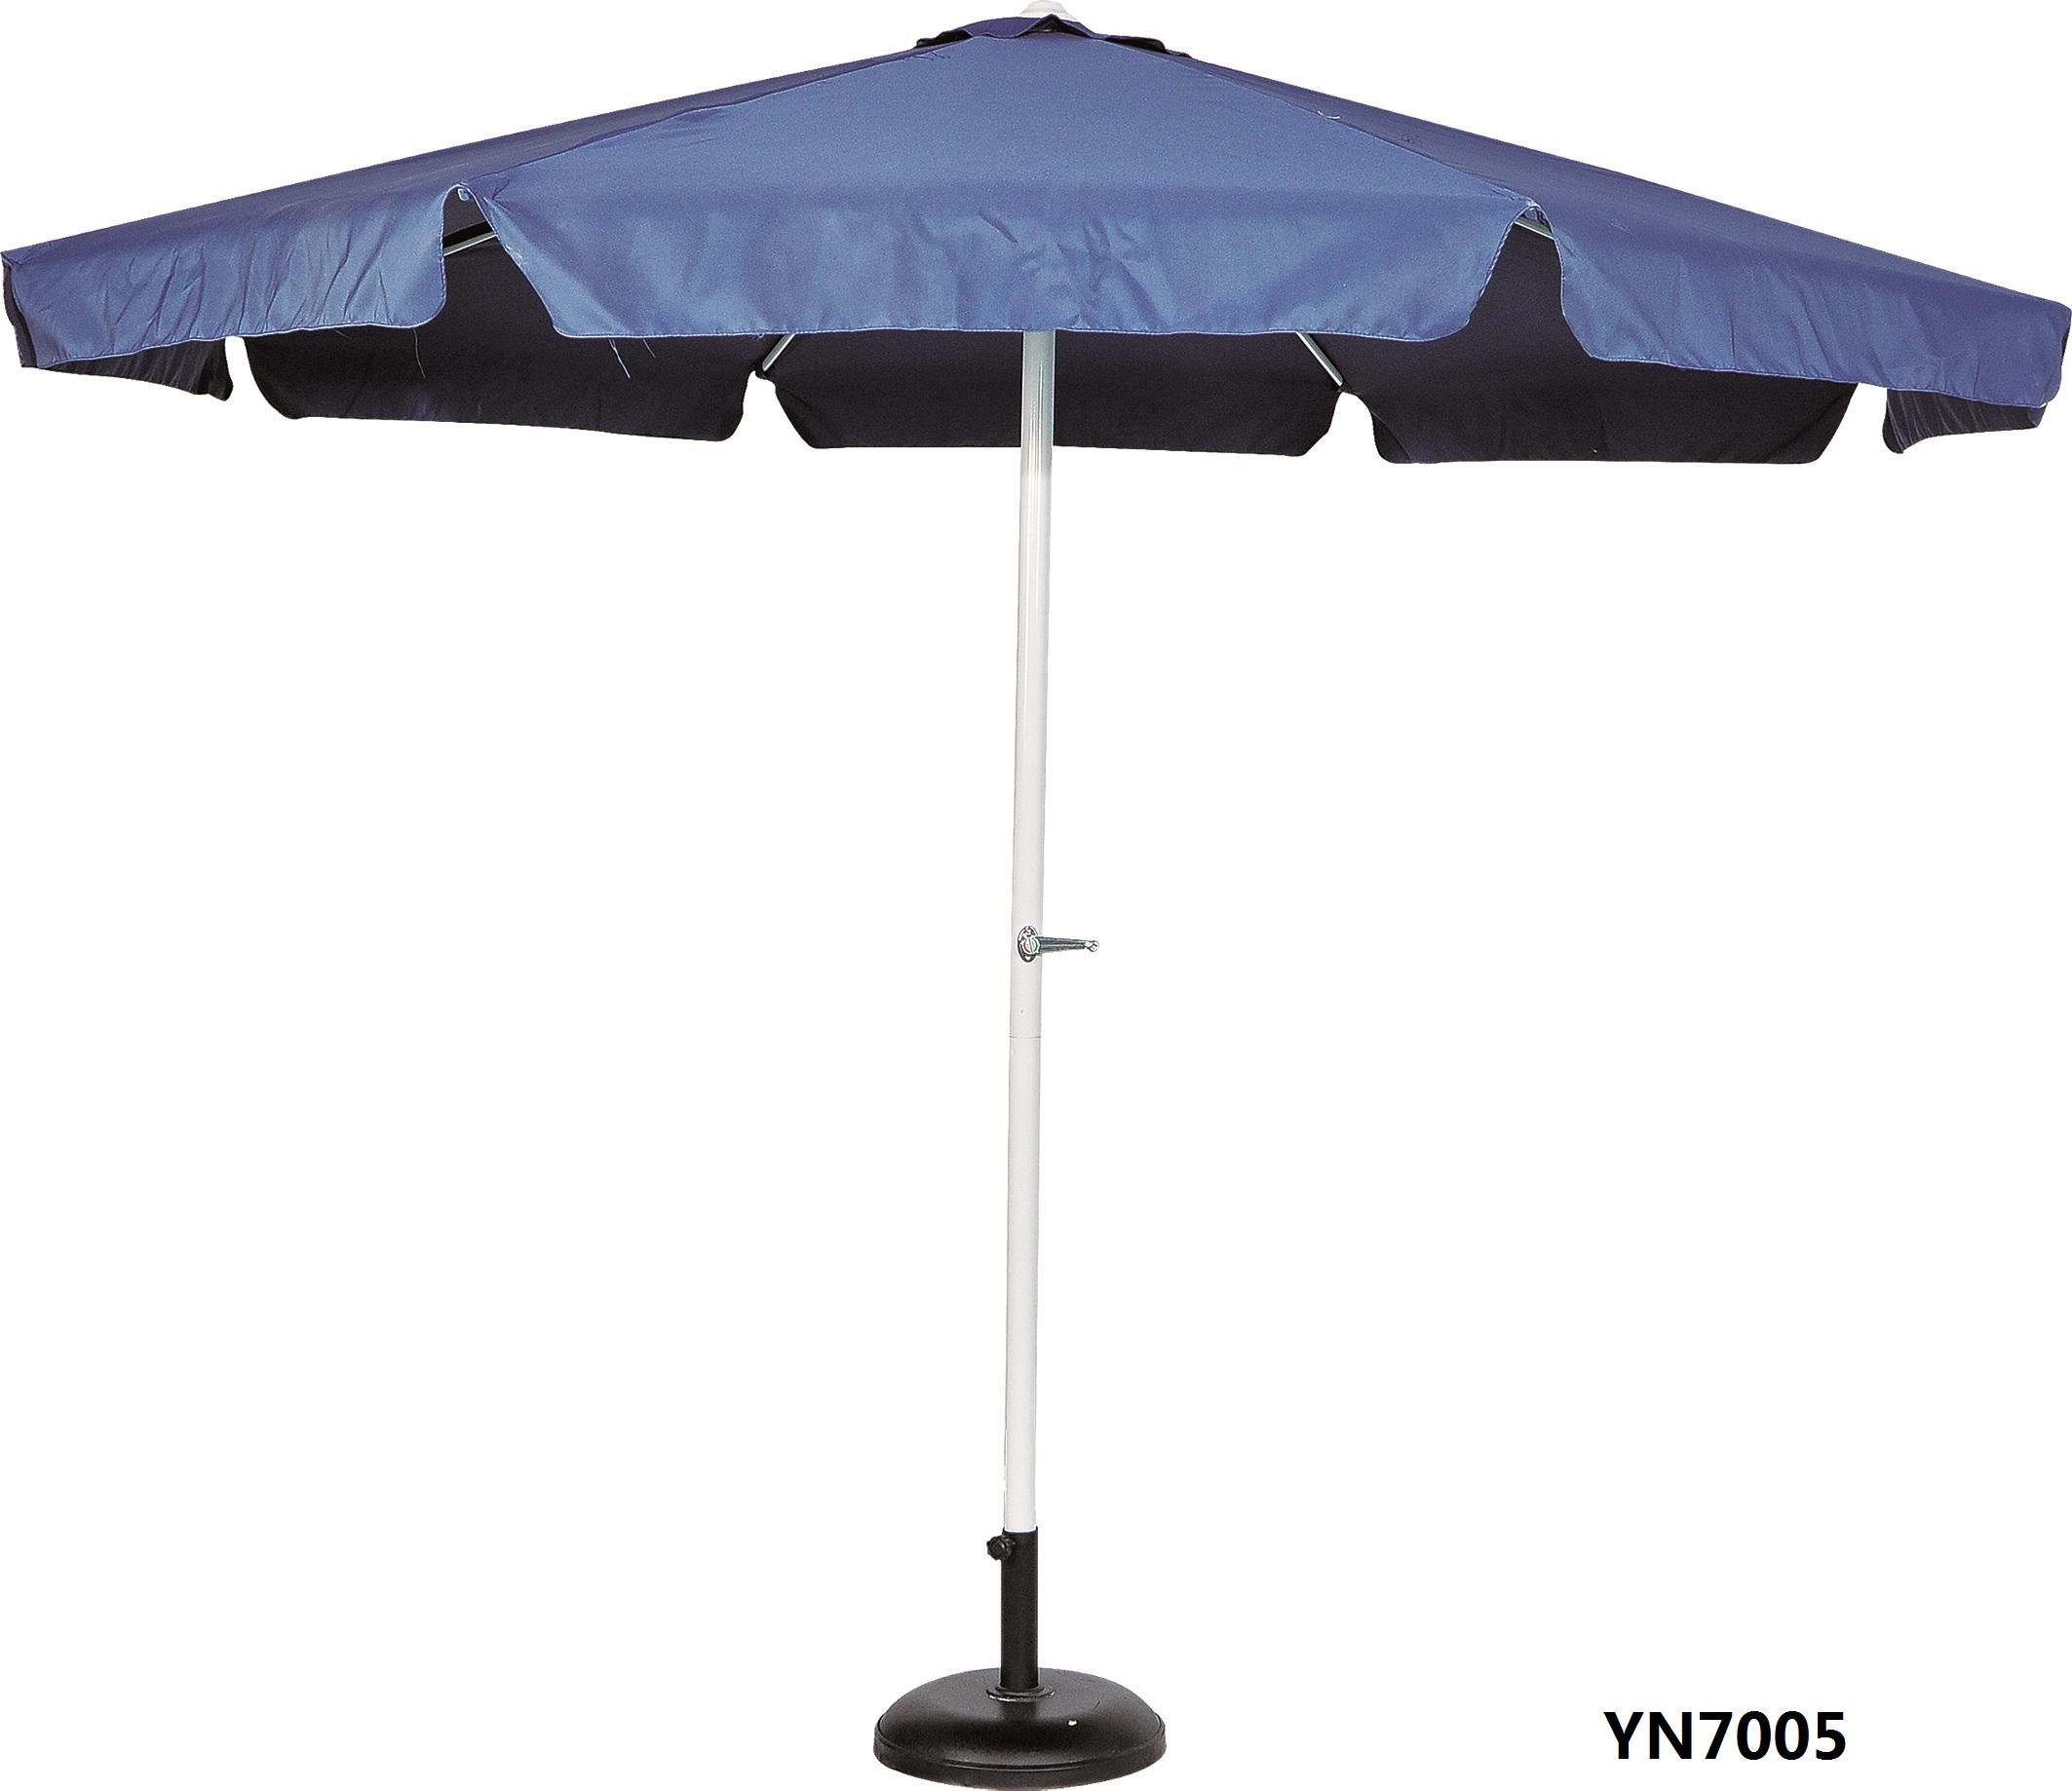 square pepsi printing outdoor parasol commercial patio umbrella buy 300cm tilt marketing promotion umbrella crank tilt outdoor umbrella fabric